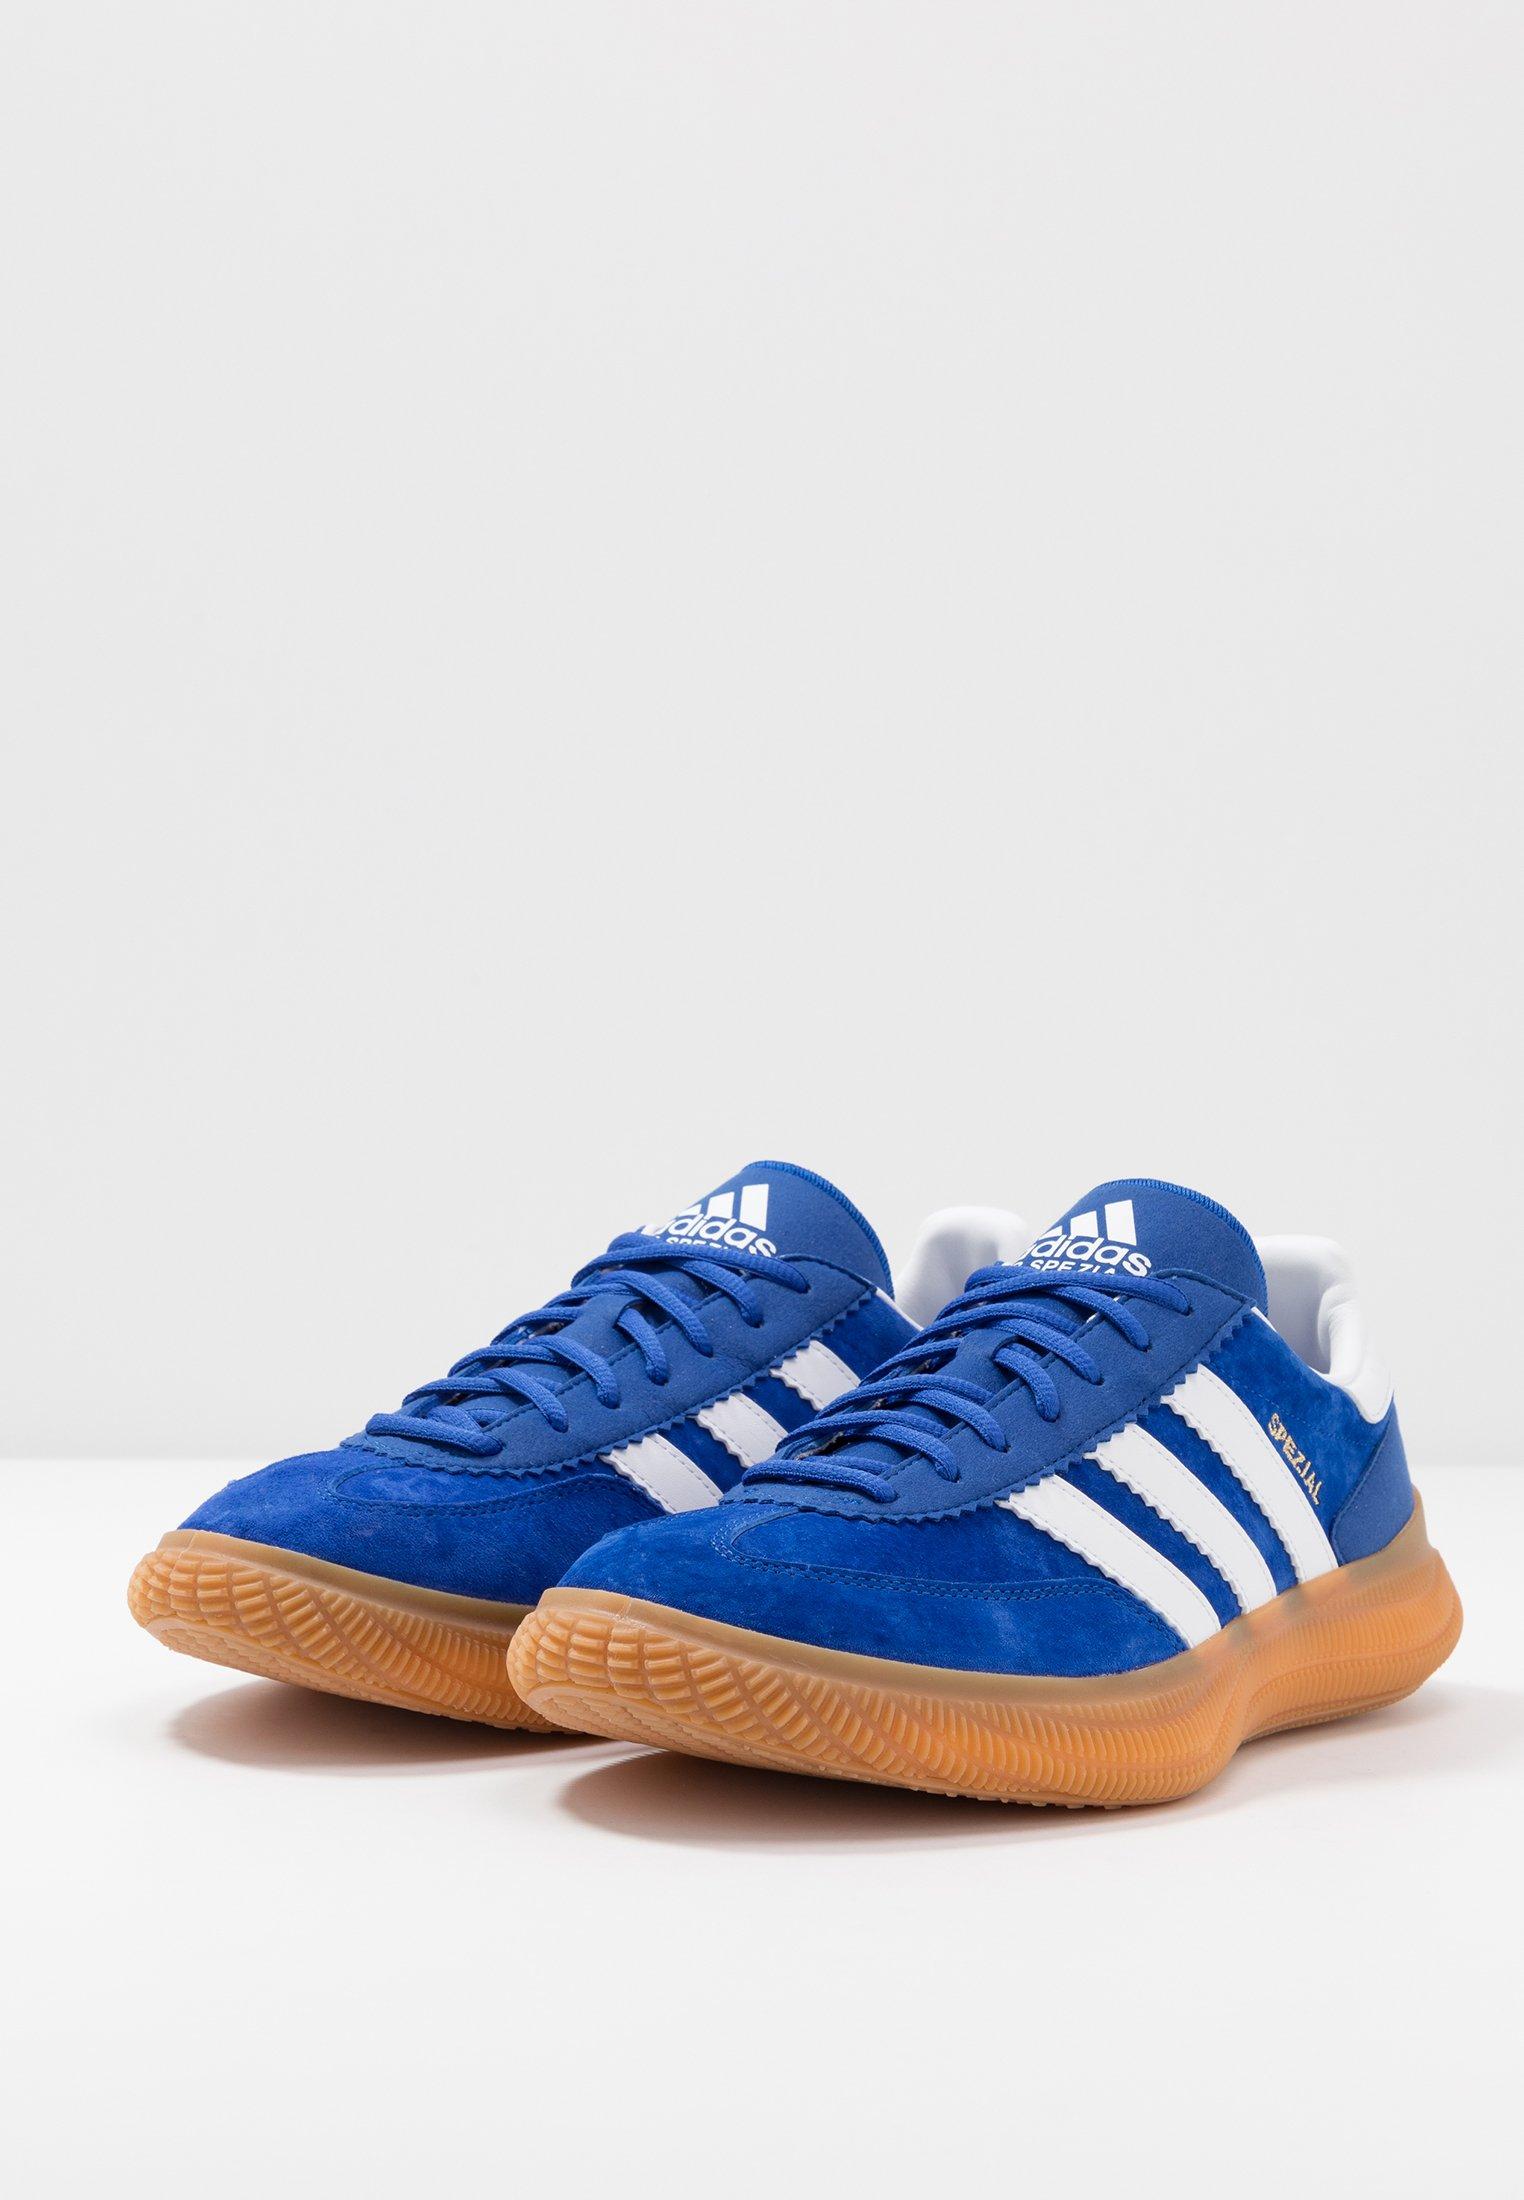 adidas Performance SPEZIAL BOOST - Handballschuh - royal/footwear white/gold metallic/blau - Herrenschuhe wkOYP